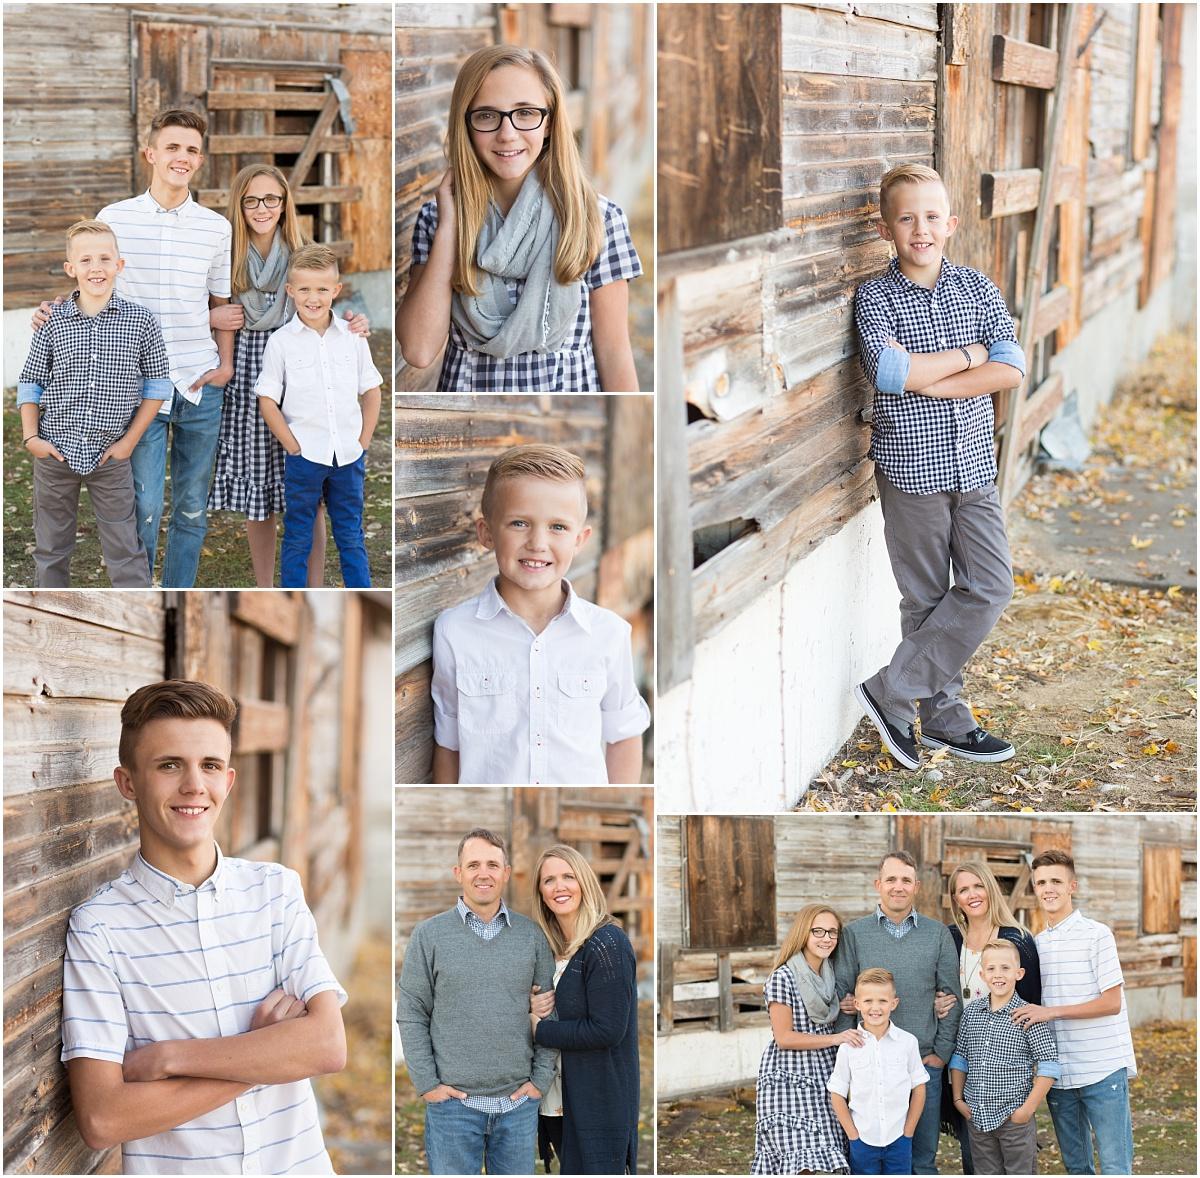 Family photography_Rustic_Boise Idaho_Eagle Island State Park_Leah Southwick Photography_0033.jpg